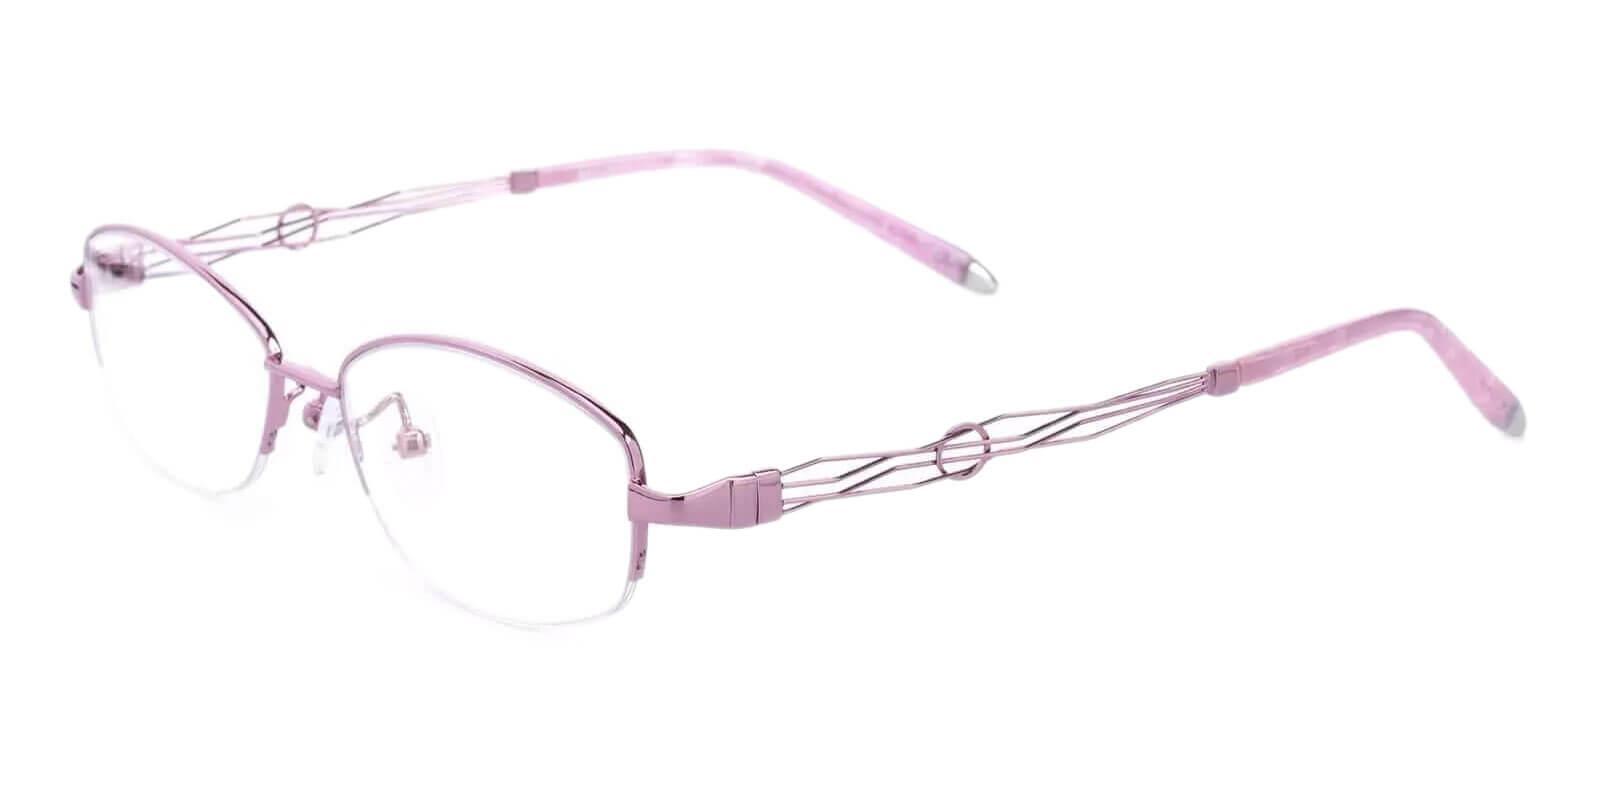 Aaliyah Pink Metal Eyeglasses , NosePads Frames from ABBE Glasses